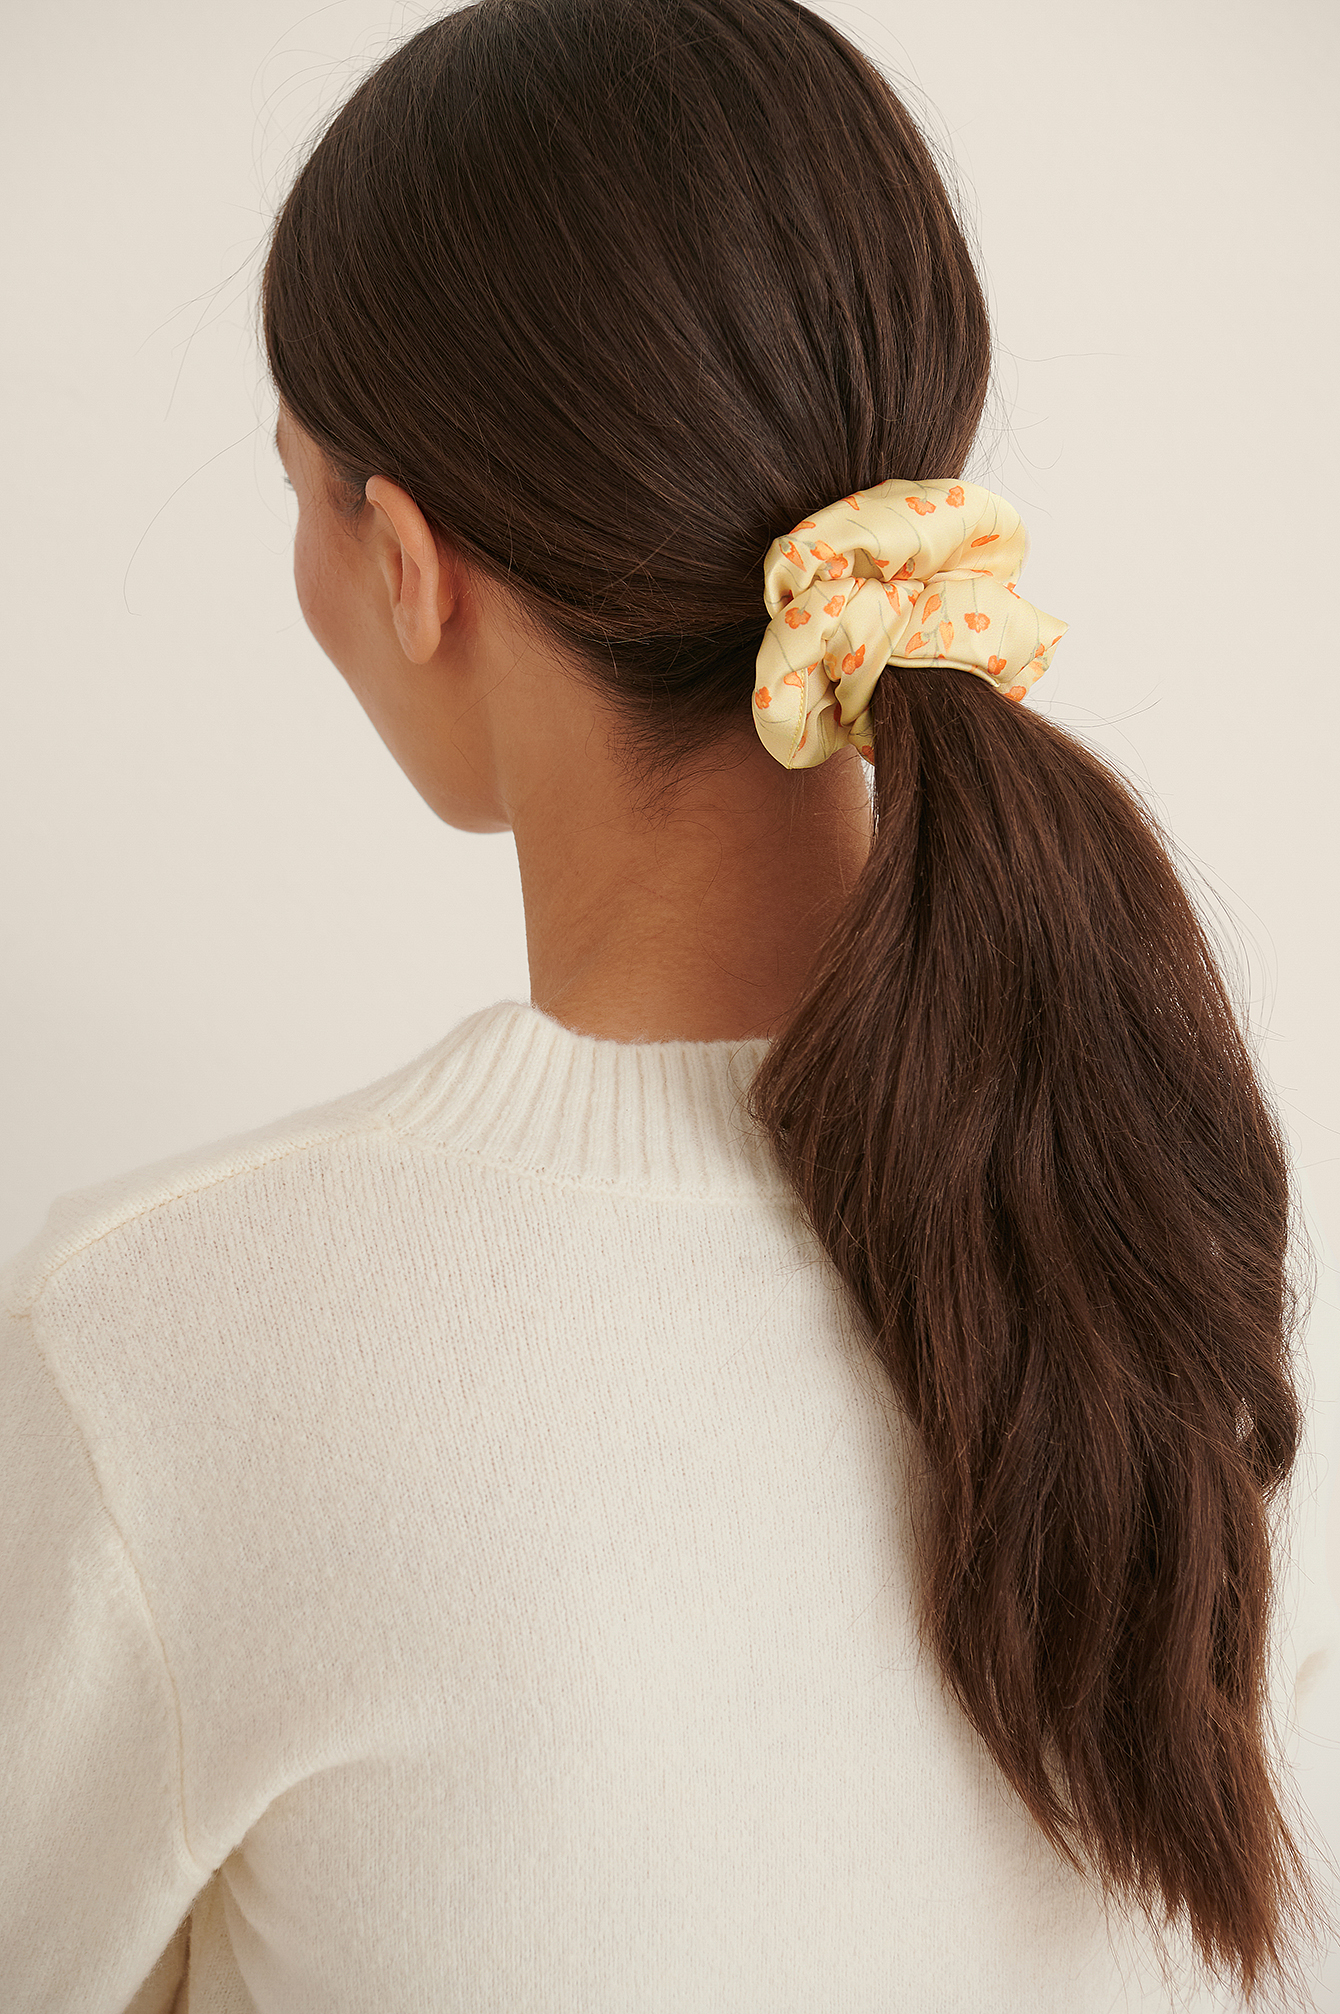 anna briand x na-kd -  Blume Haargummis - Multicolor